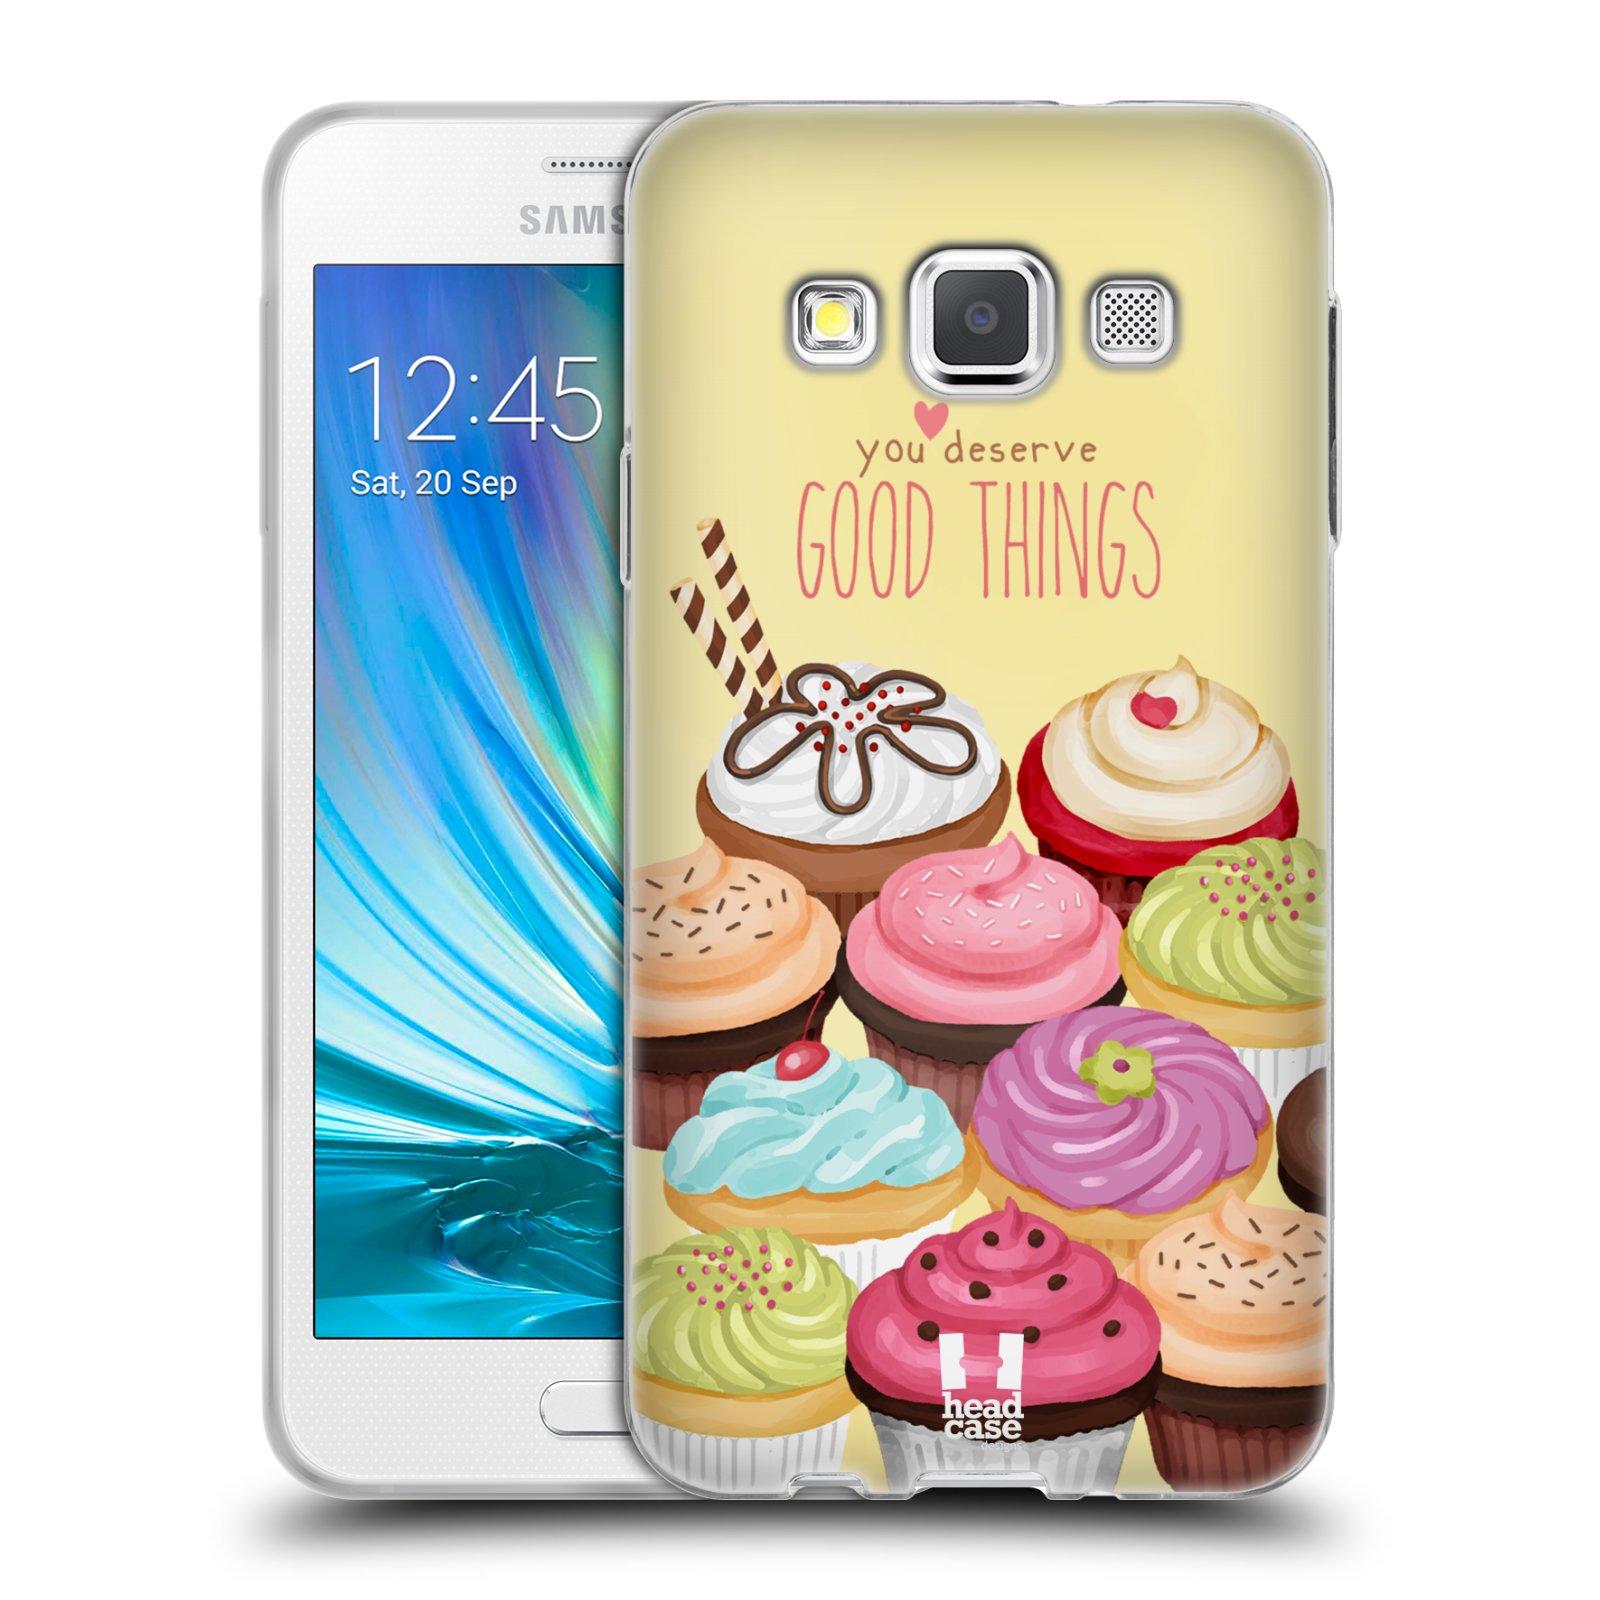 Silikonové pouzdro na mobil Samsung Galaxy A3 HEAD CASE CUPCAKE GOOD THINGS